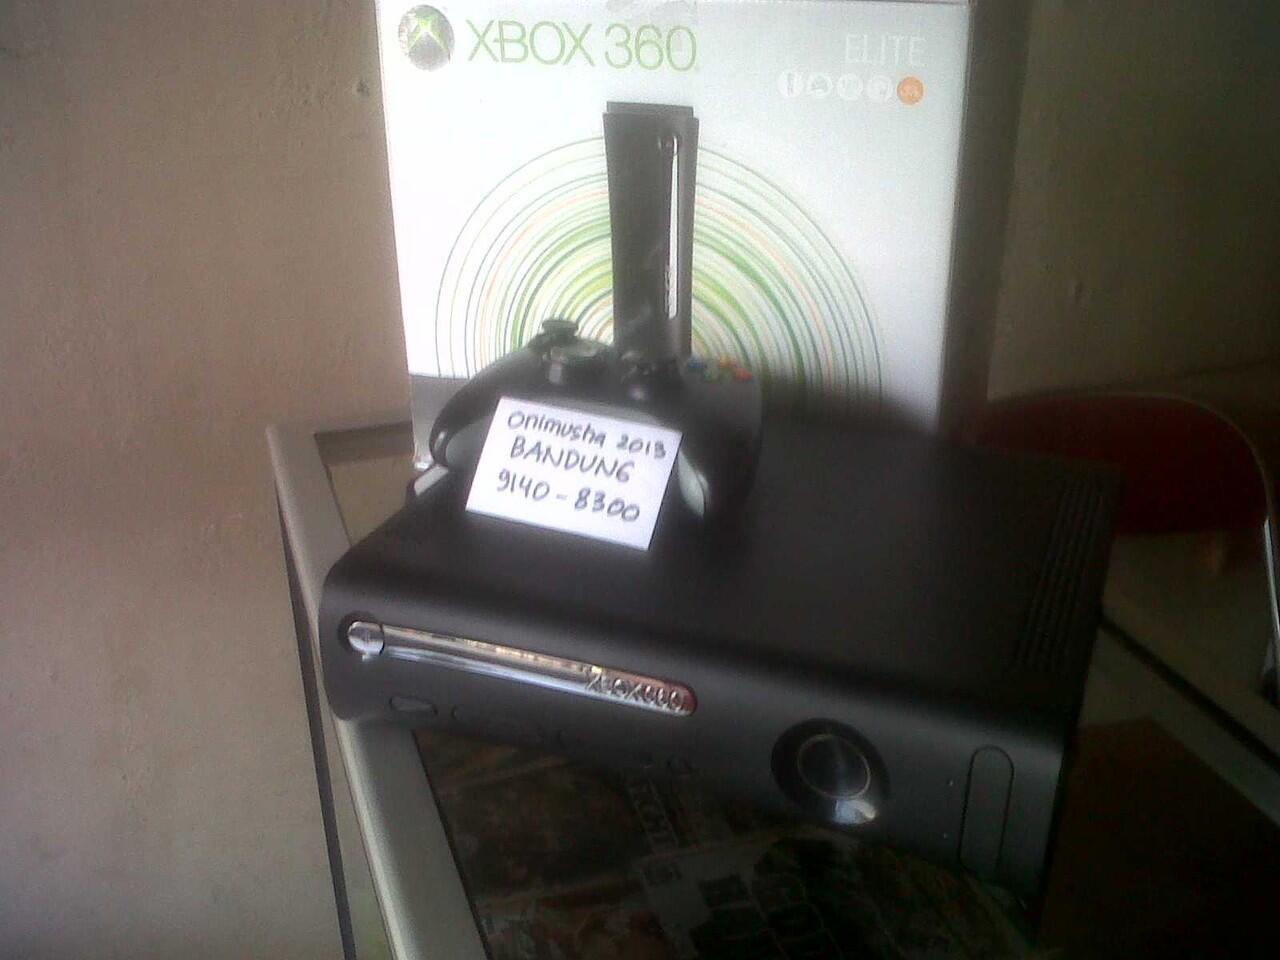 XBOX 360 Jasper Elite 120GB RGH Fullset. METRO BANDUNG.